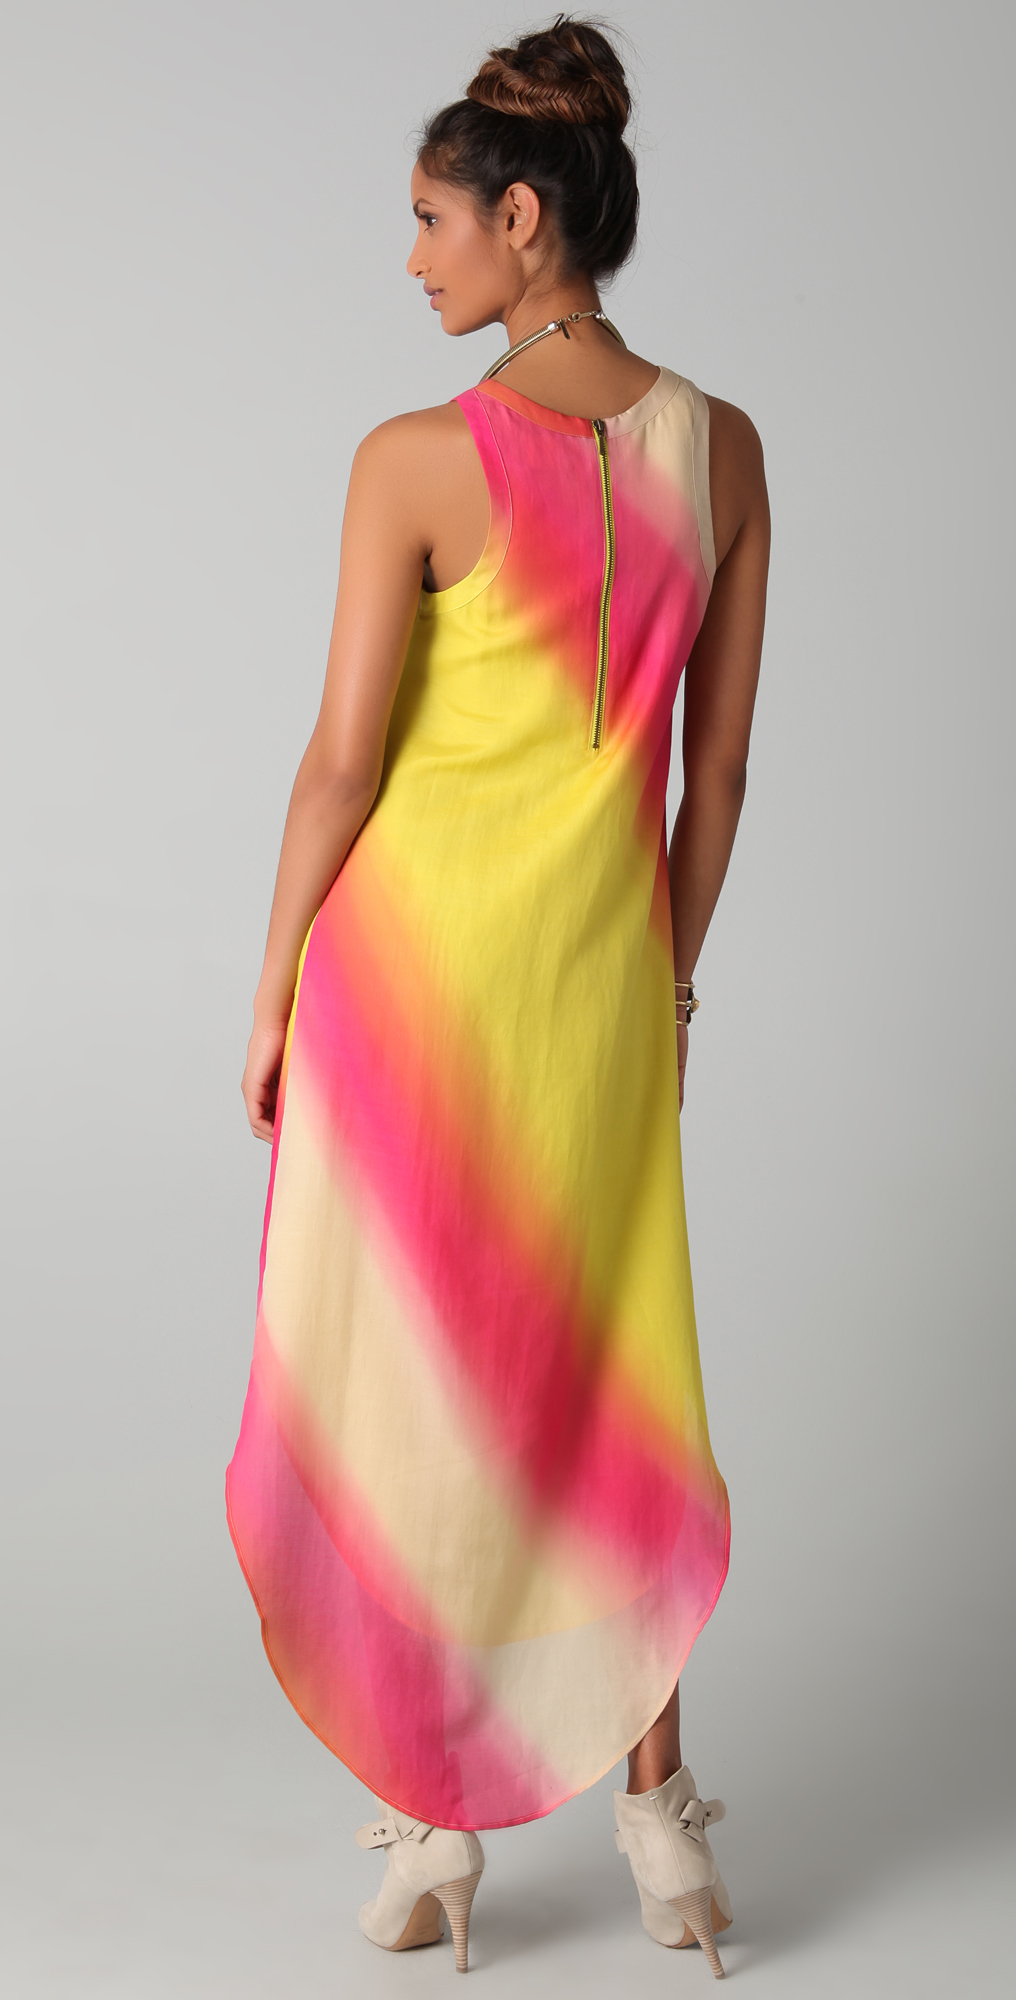 Sass Bide Secret Place Sunburst Print Dress Shopbop